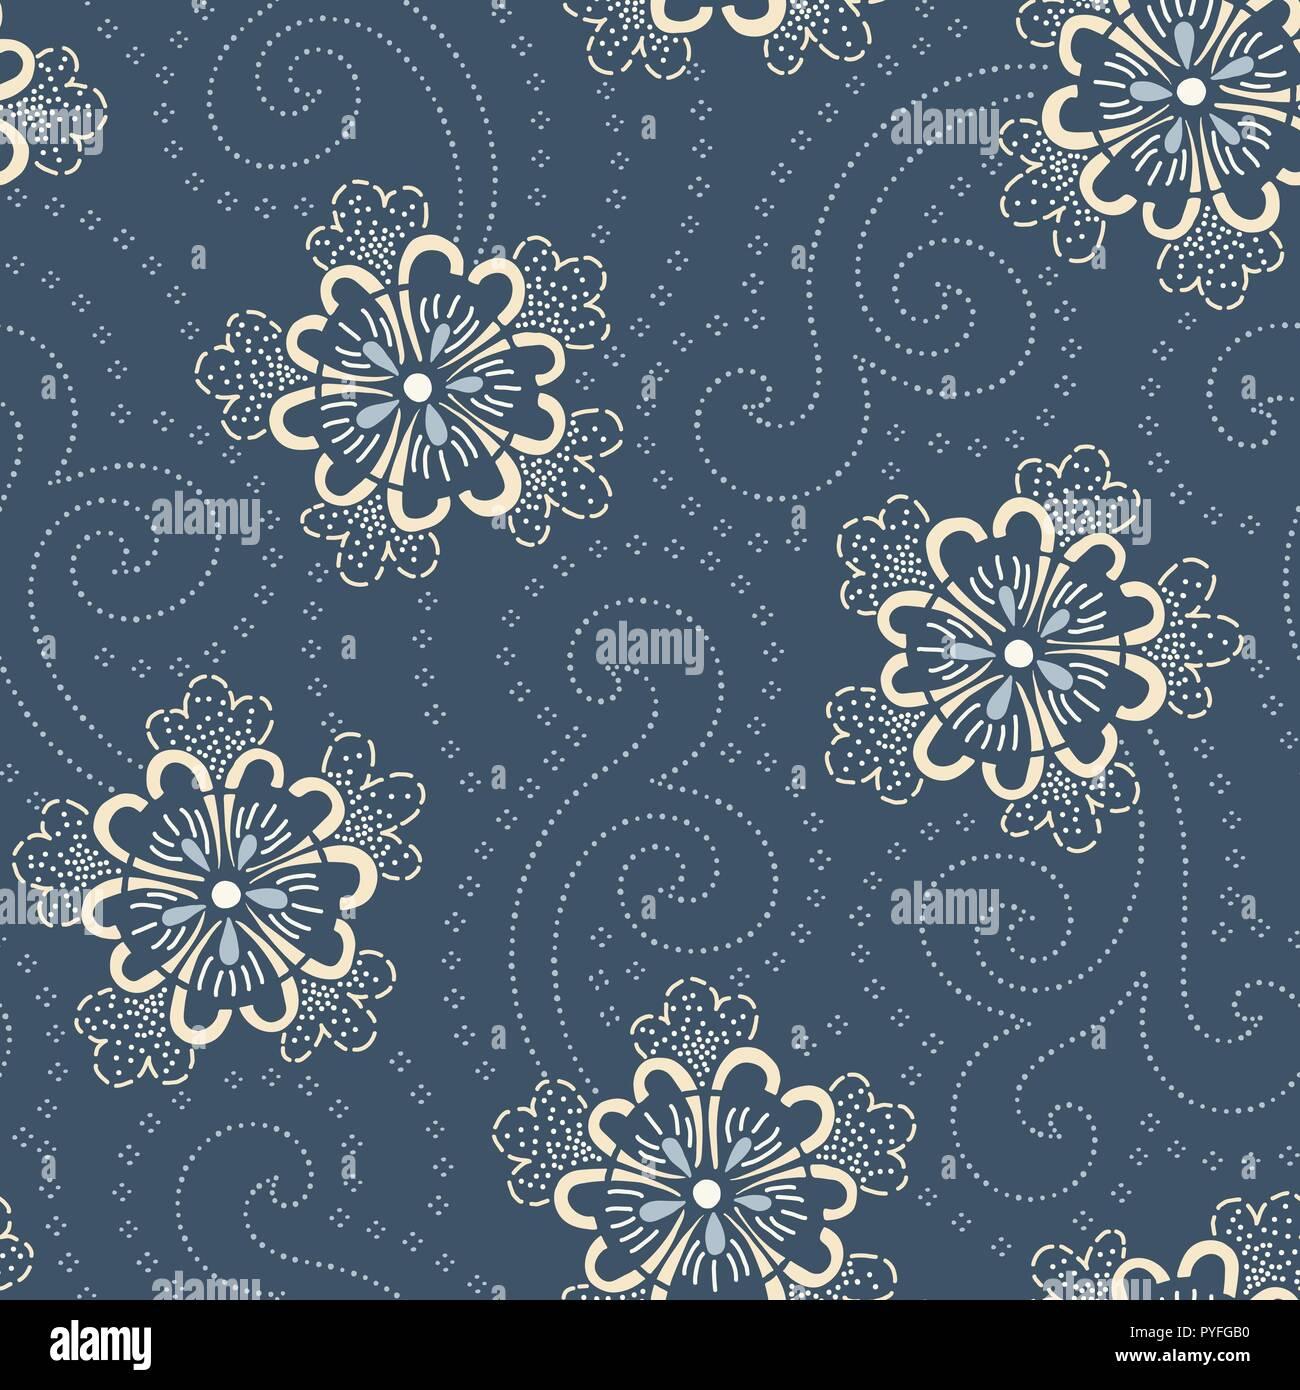 Indigo Hand Drawn Japanese Floral Vector Seamless Pattern